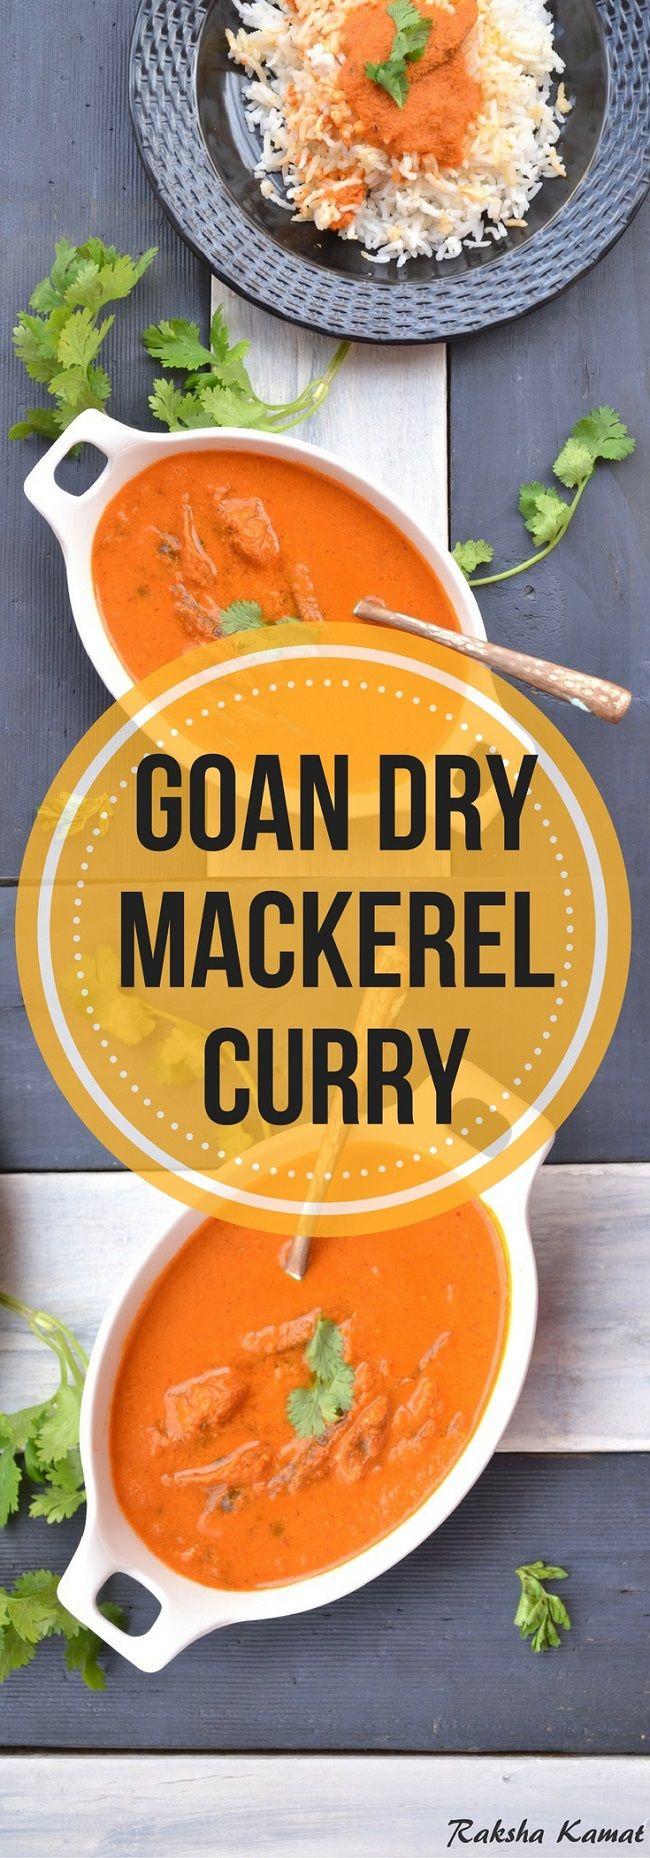 Goan Fish Curry with Dry Mackerel ,Sukya Bangdyache Hooman, dry fish recipes, Goan fish curry, dry fish curry